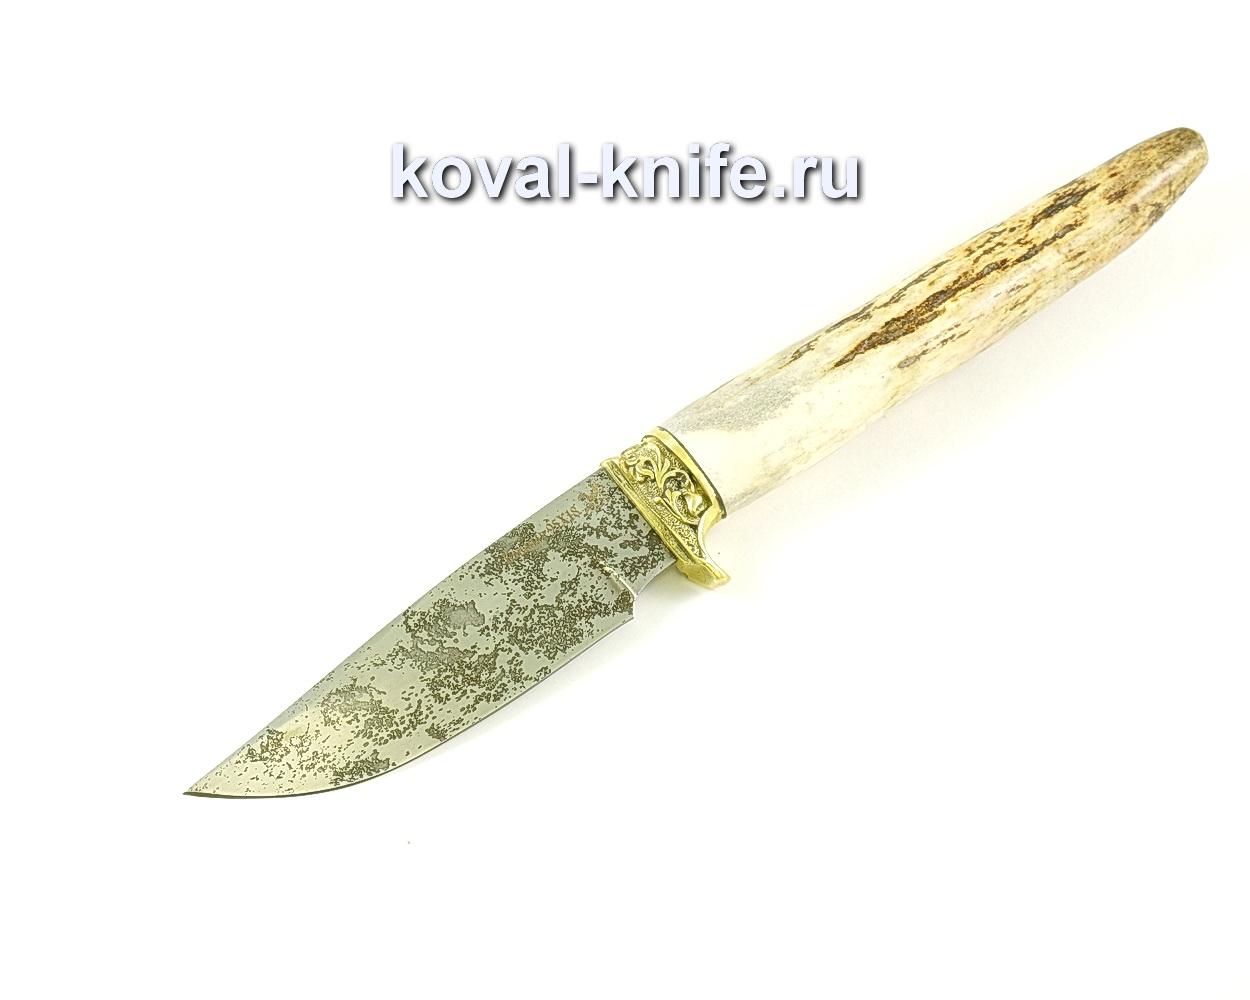 Нож Норвег (сталь 95х18), рукоять рог, литье A264